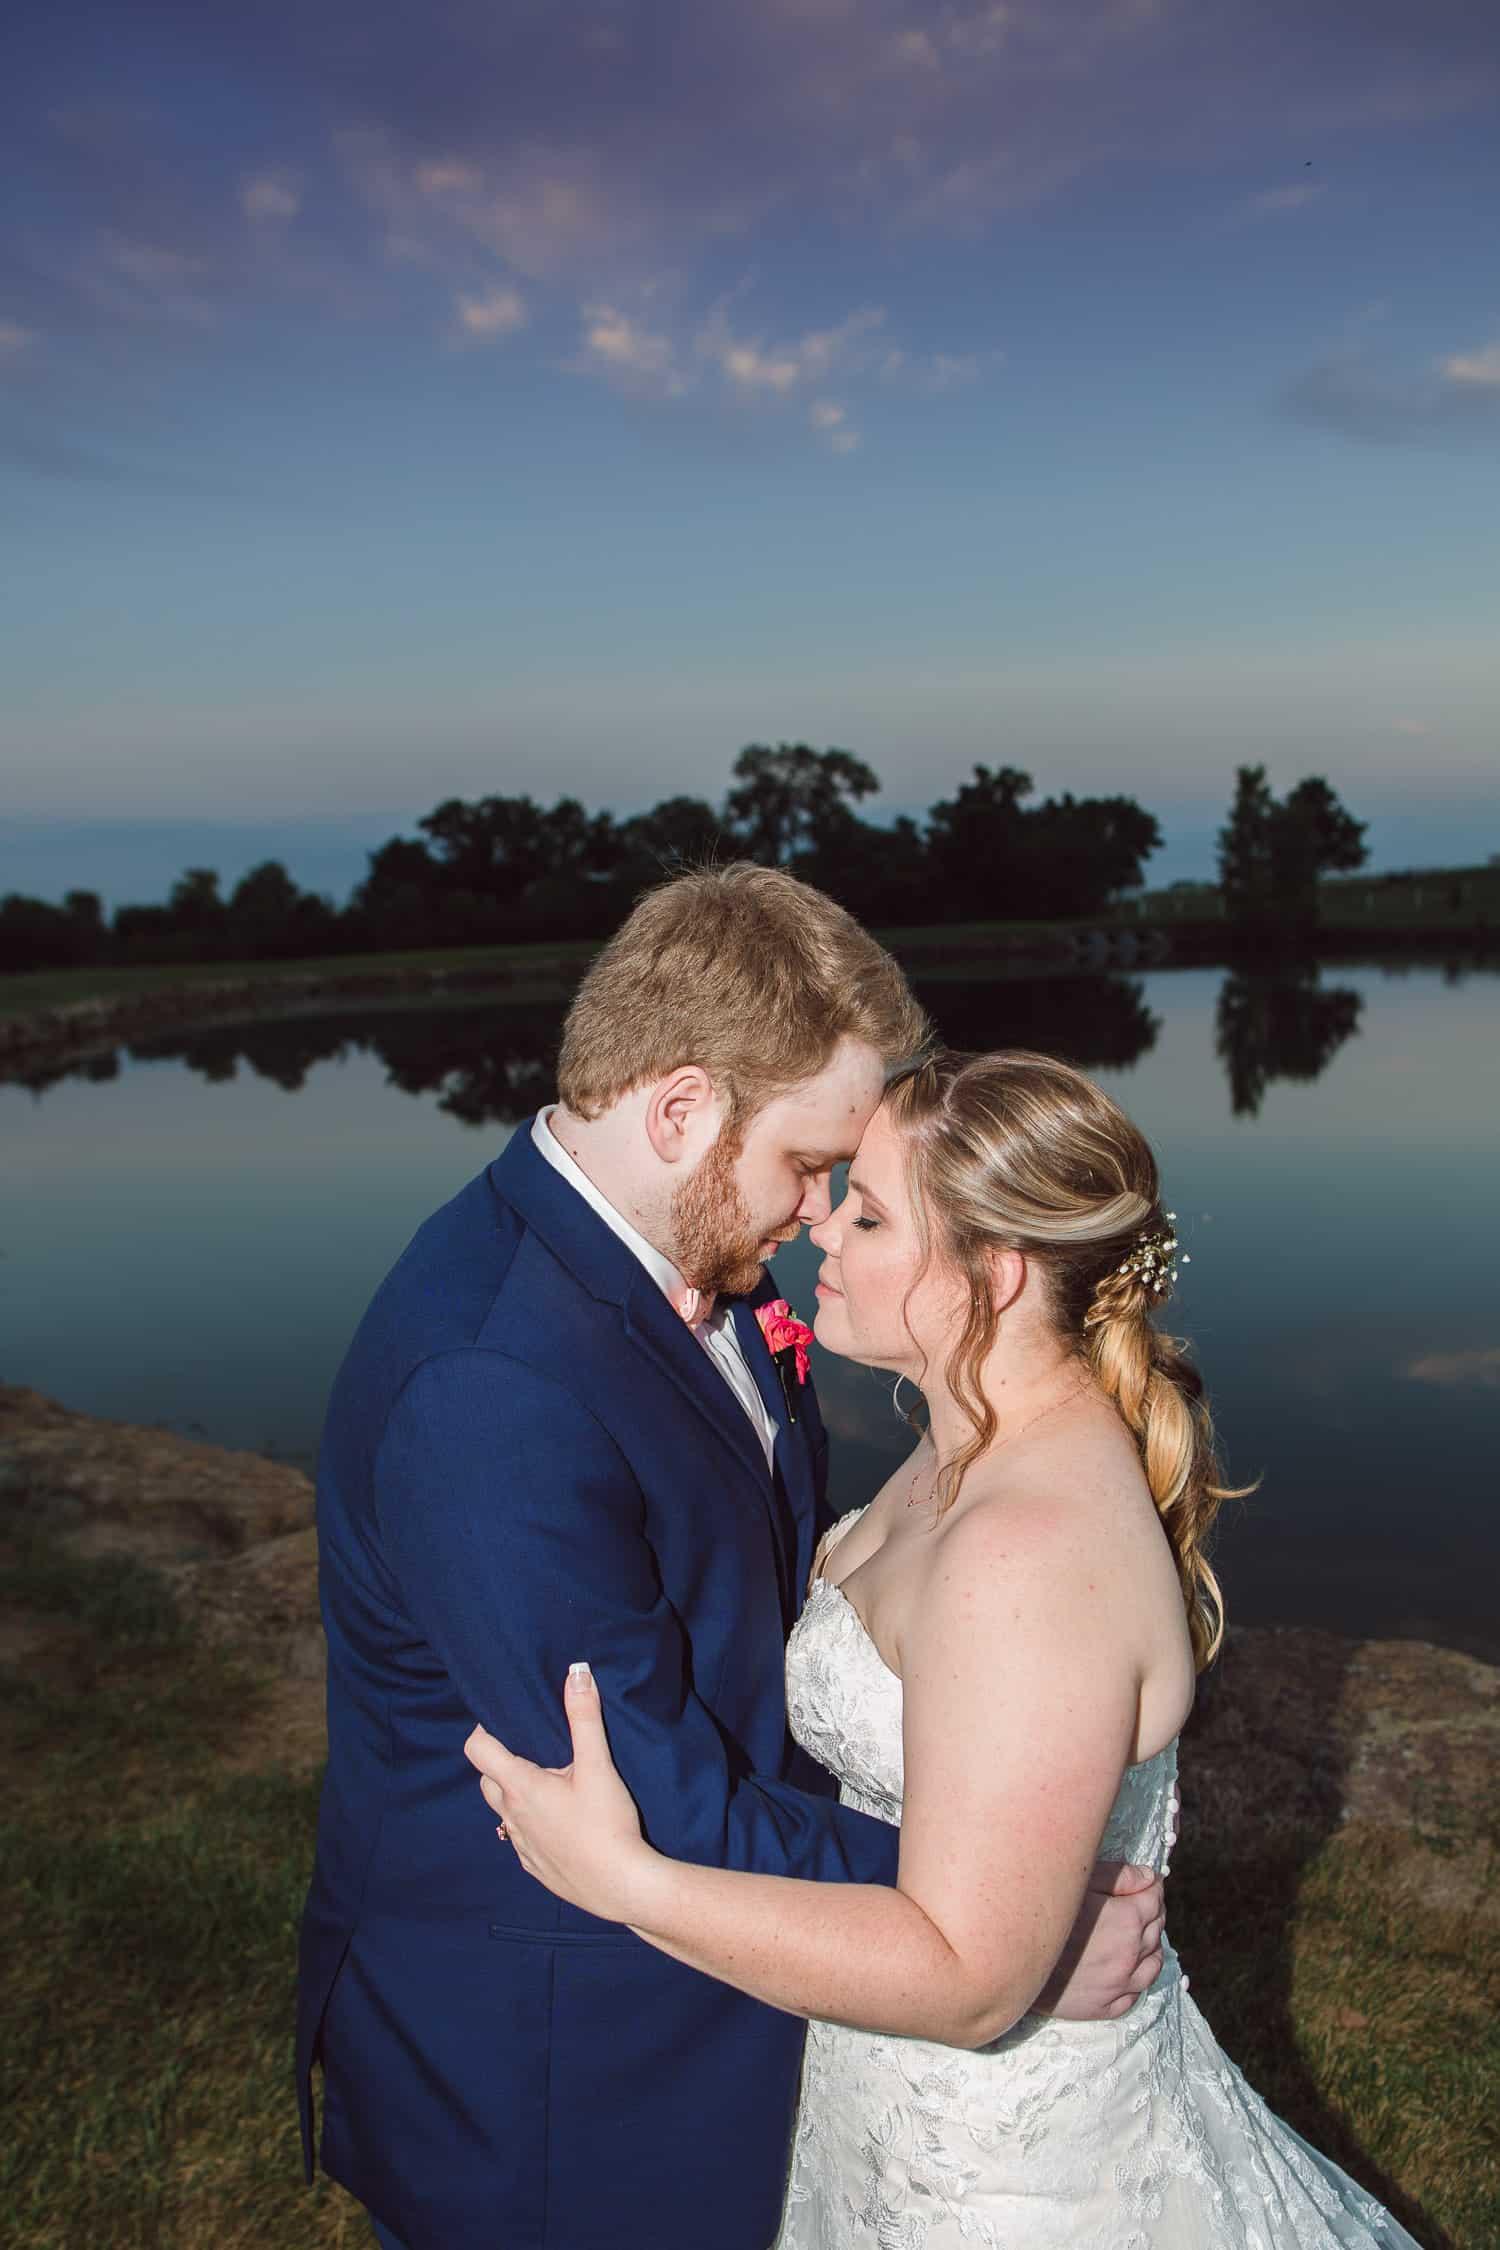 Sunset photos at the Fire Stables Lenexa wedding venue